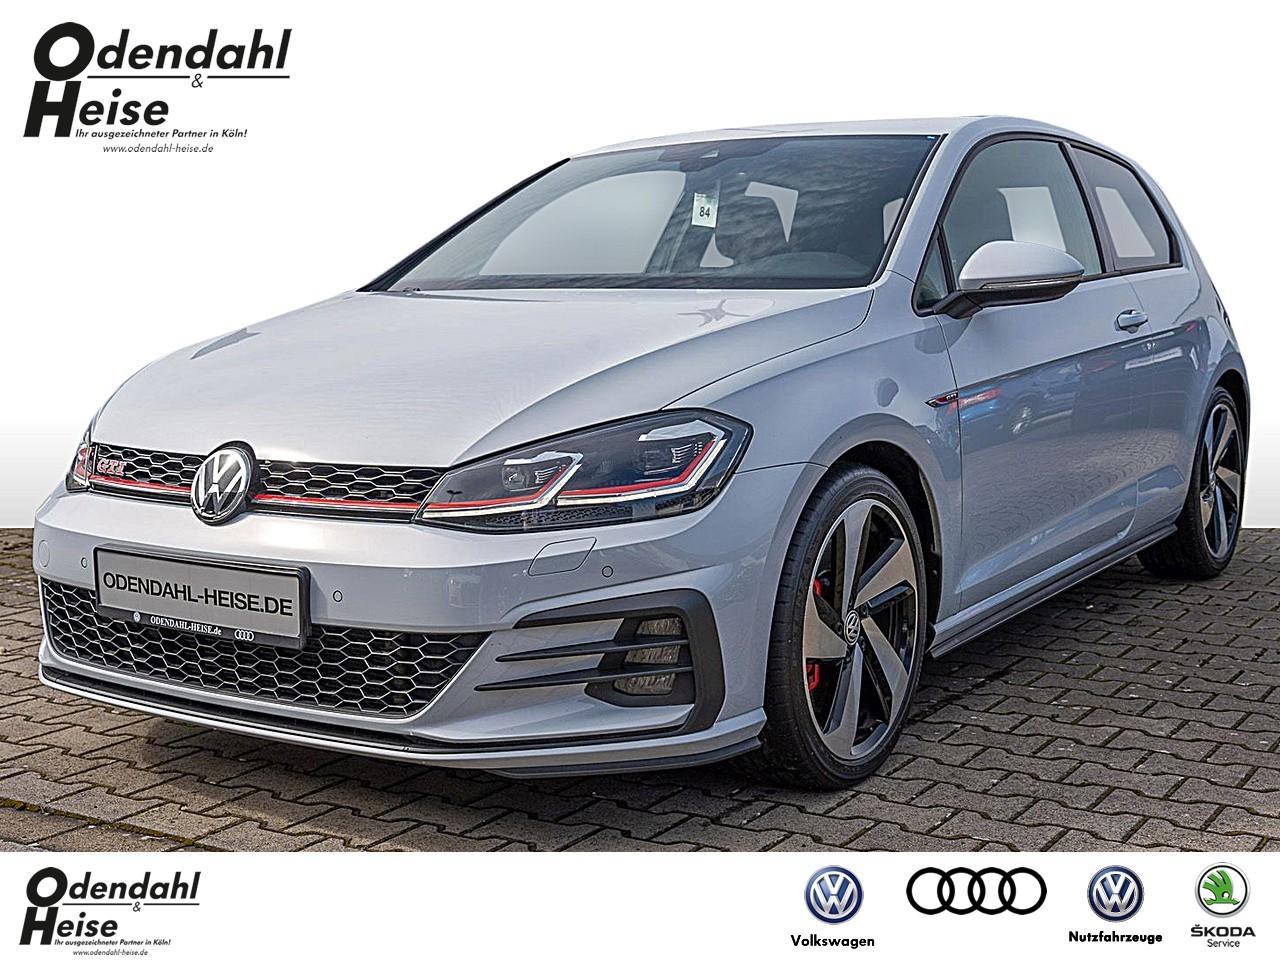 Volkswagen Golf VII 2.0 TSI DSG GTI Performance Klima Navi, Jahr 2017, Benzin